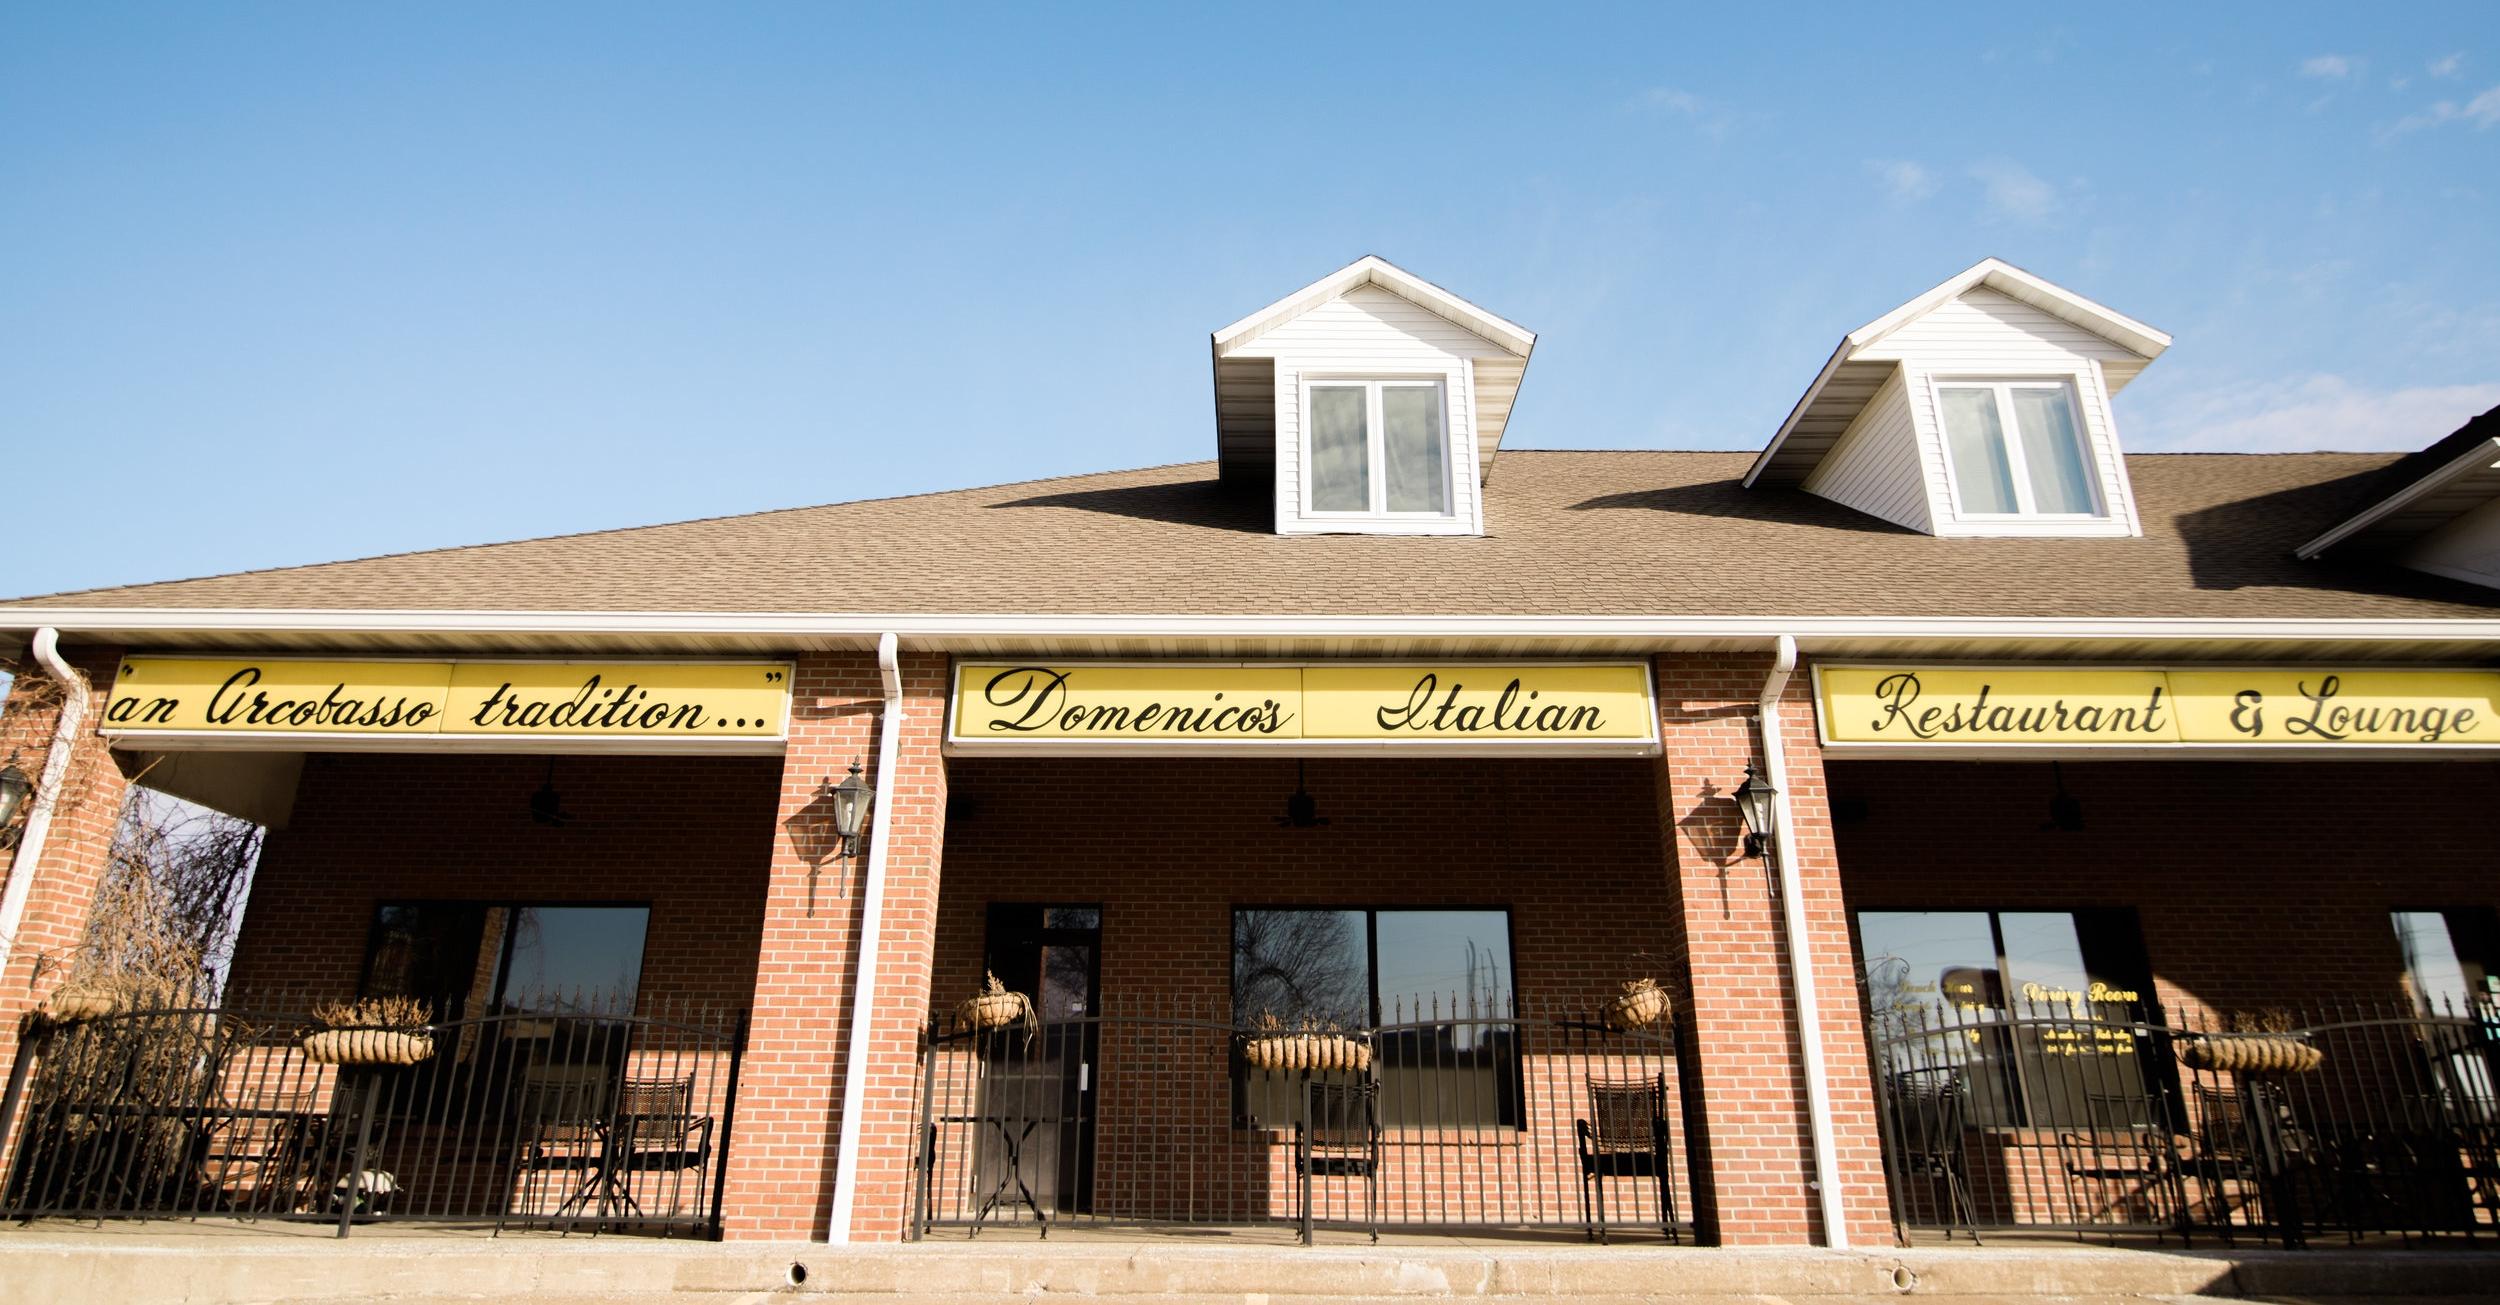 Domenico's Restaurant & Catering Jefferson City, MO